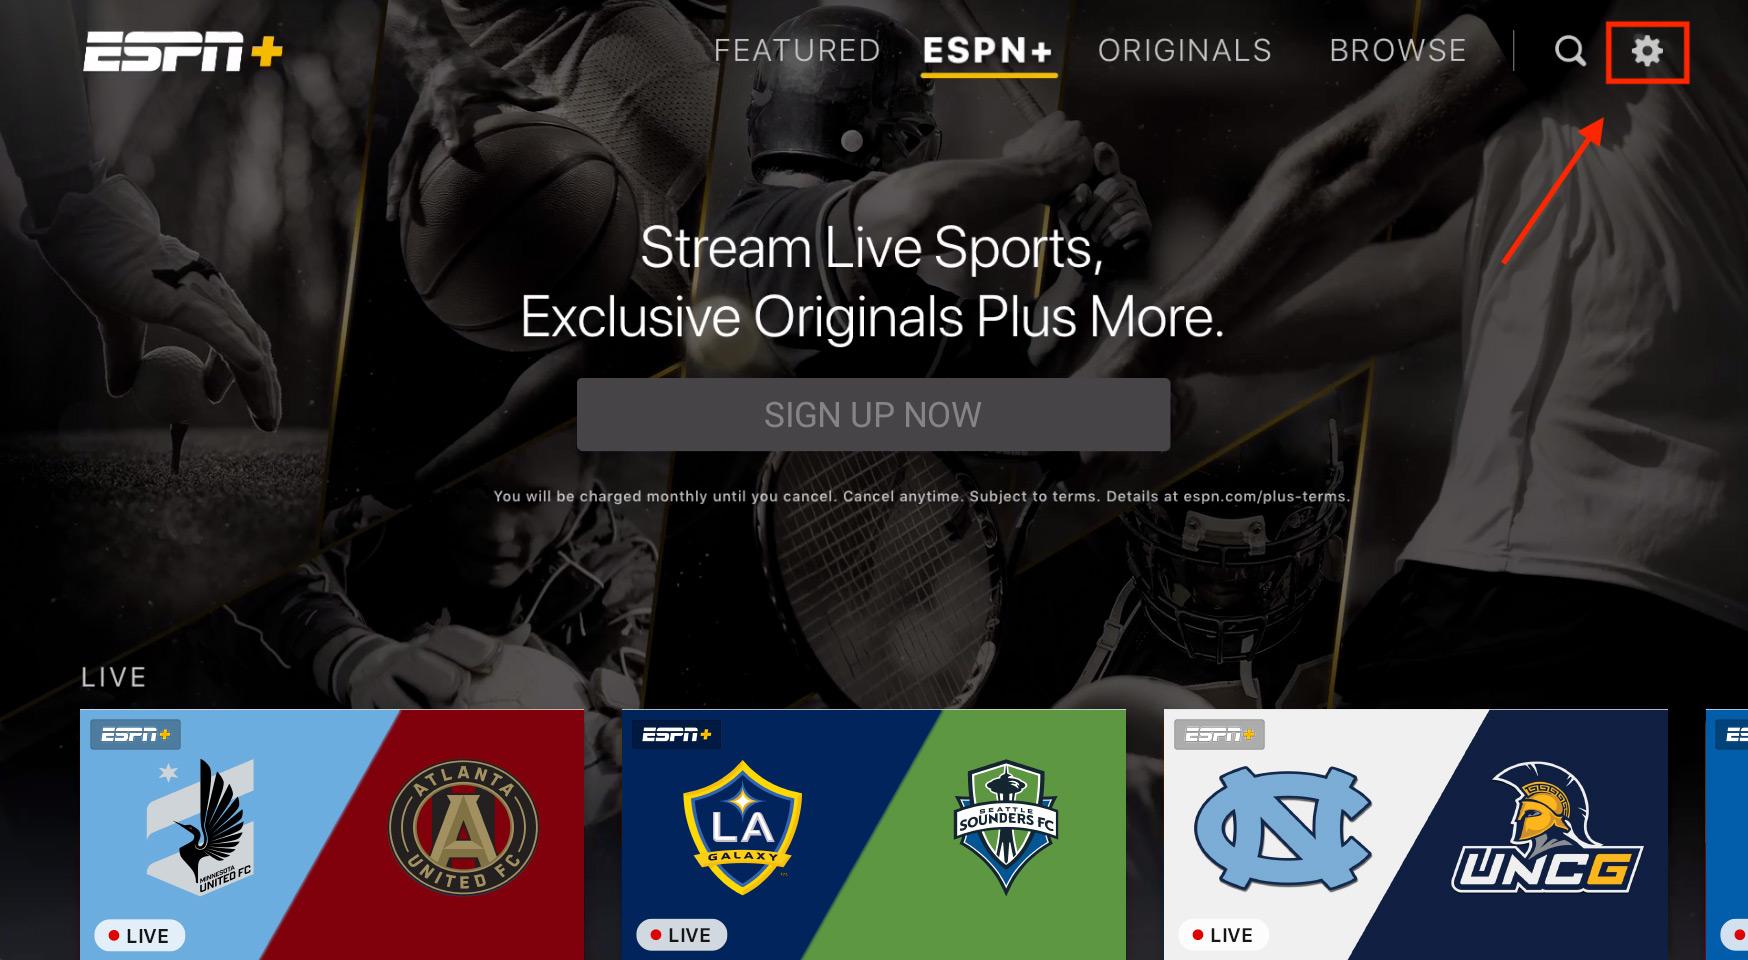 Apple tvOS: Subscription Linking – ESPN+